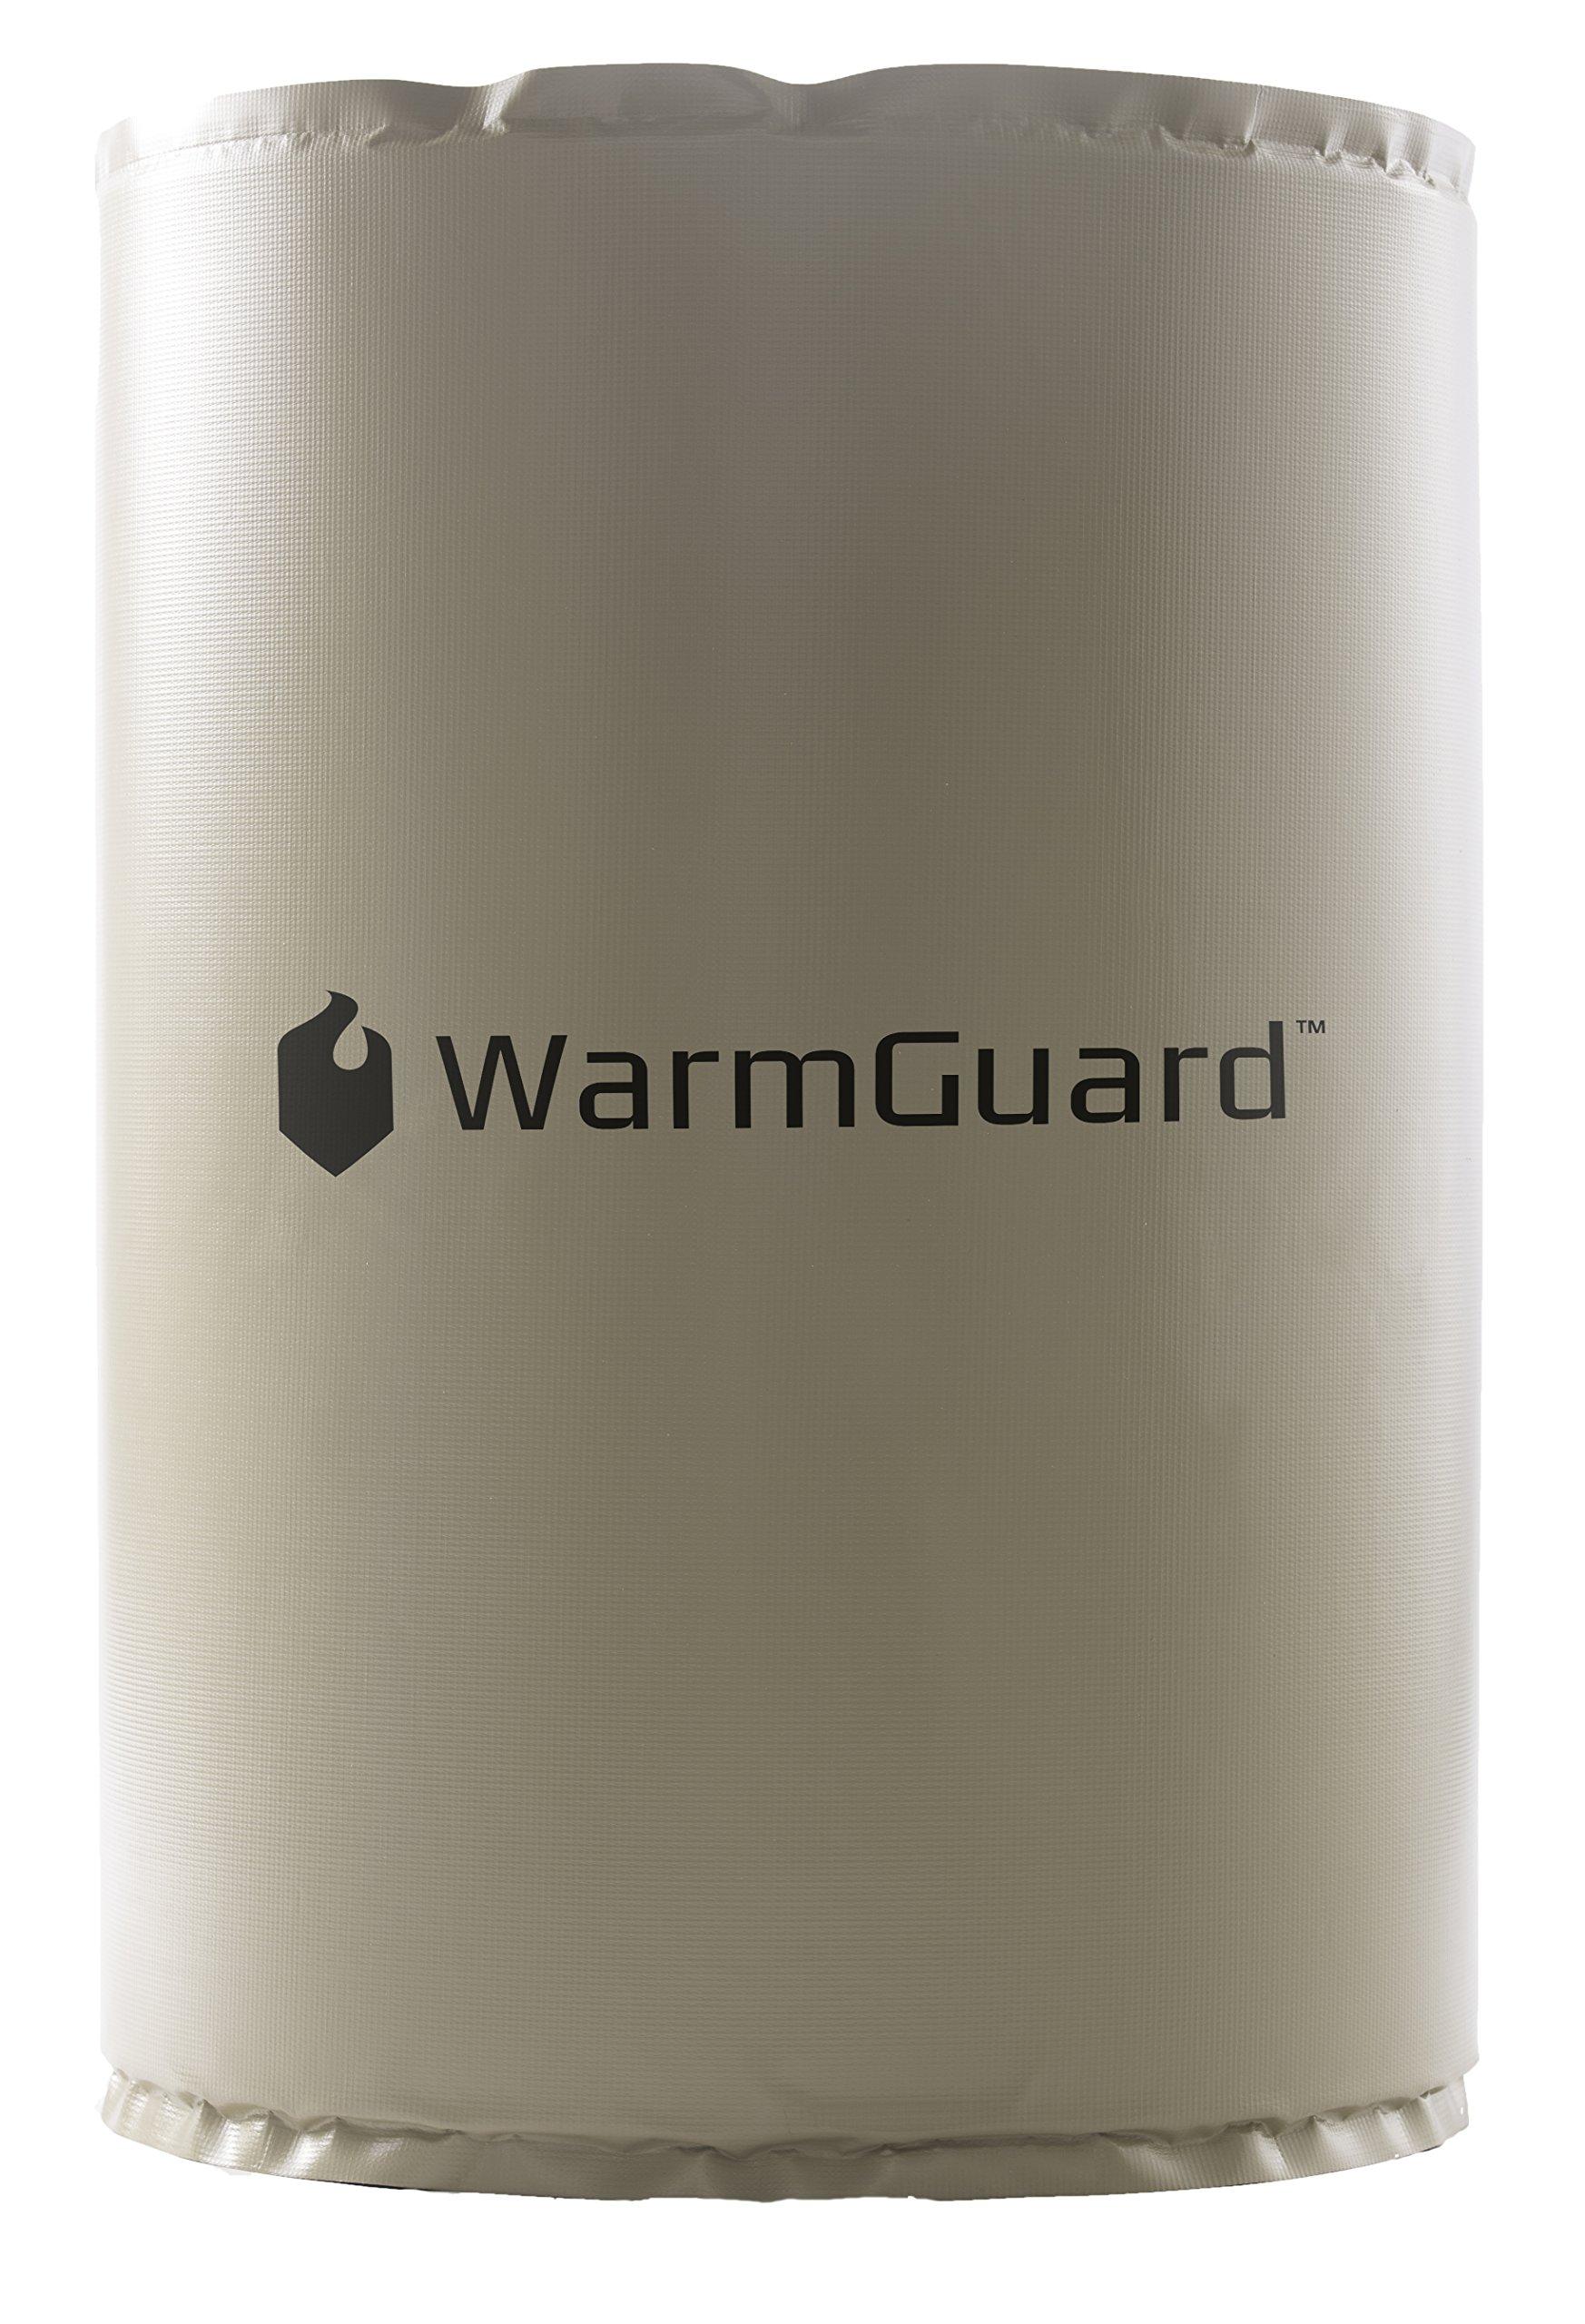 WarmGuard WG55F Insulated Full Coverage Drum Heating Blanket - Barrel Heater, Fixed Internal Thermostat Max Temp 145 F